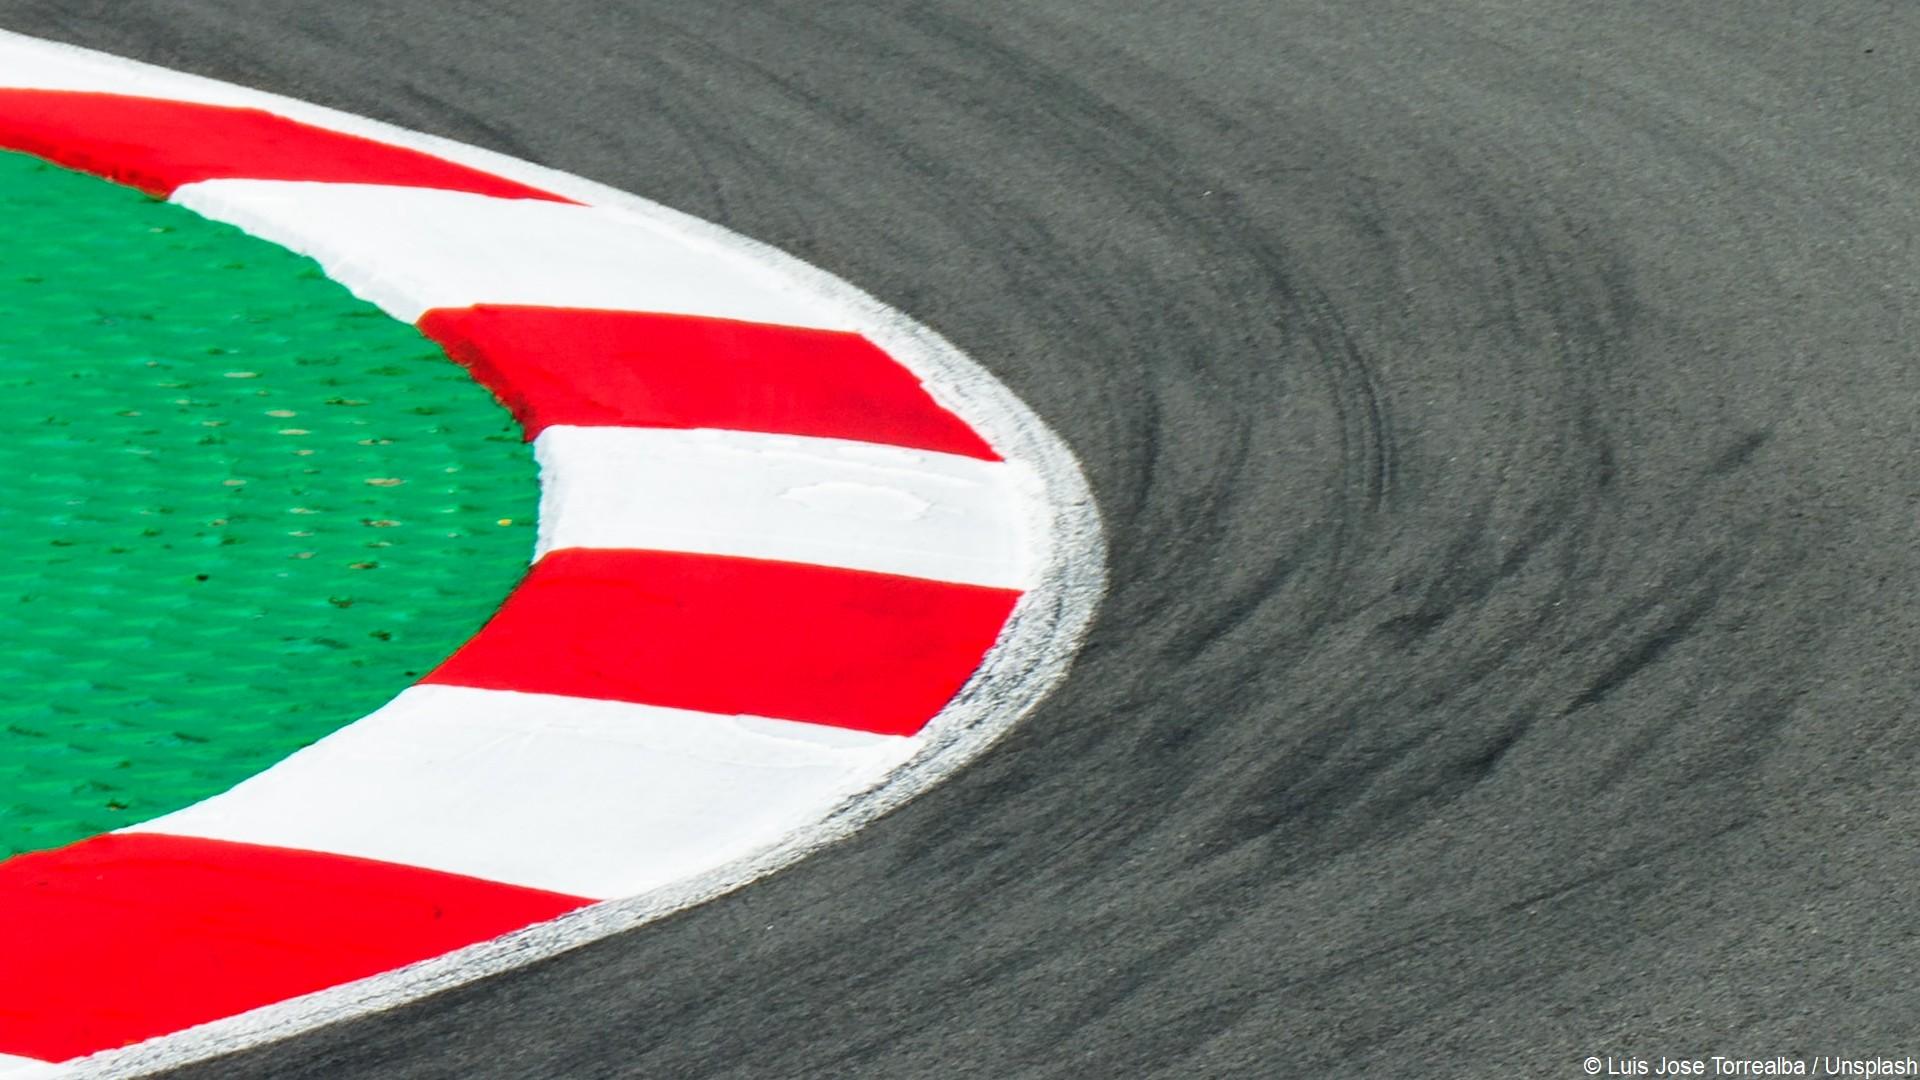 Sport Auto circuit (c) Luis Jose Torrealba Unsplash